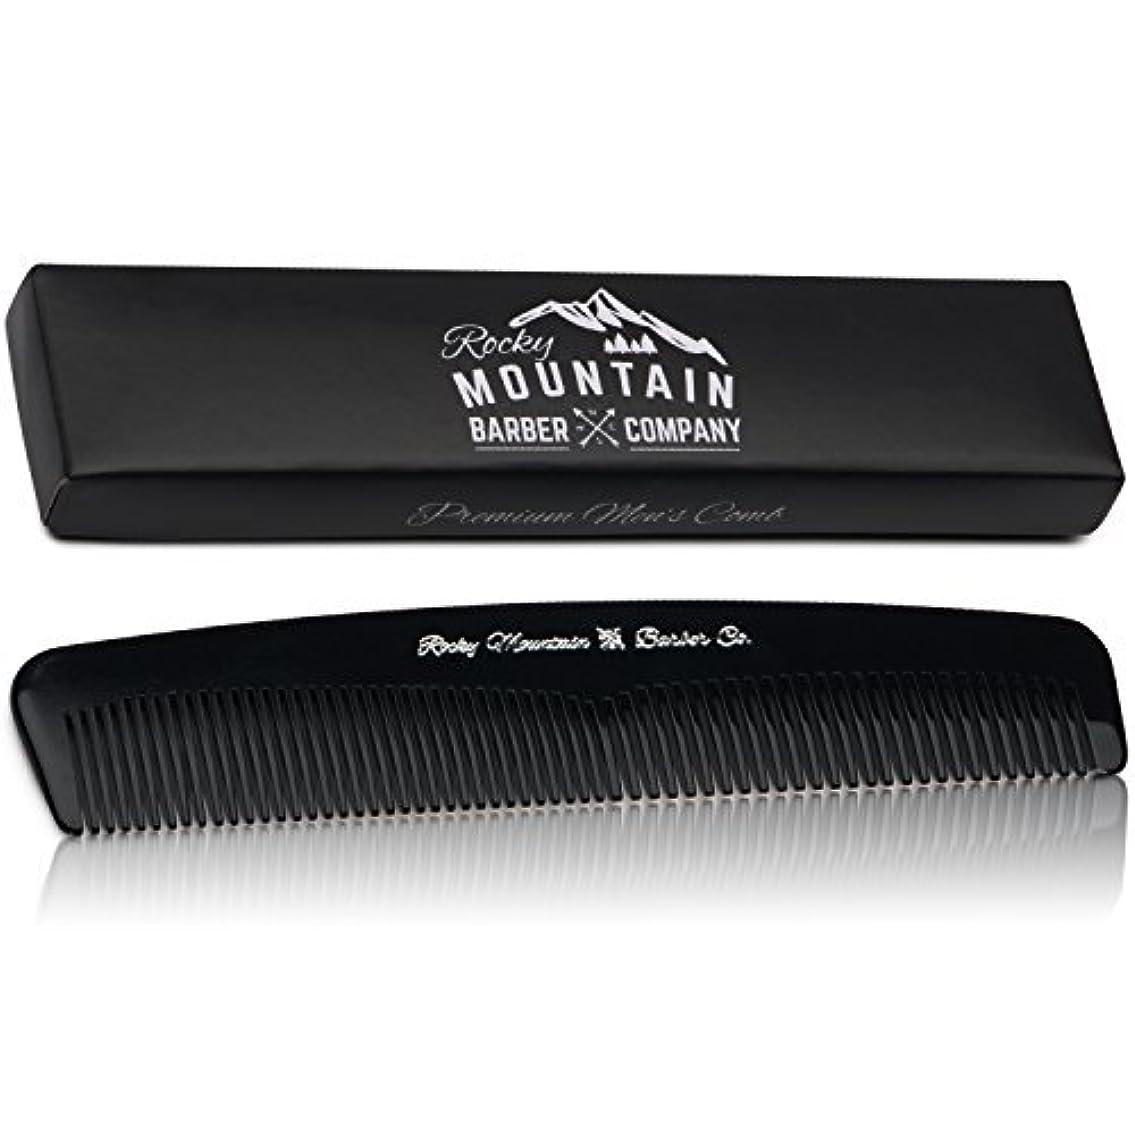 Men's Hair Comb ? Plastic Modern Fine and Medium Tooth Comb Handmade for Head Hair, Beard,  Mustache - No Snag...